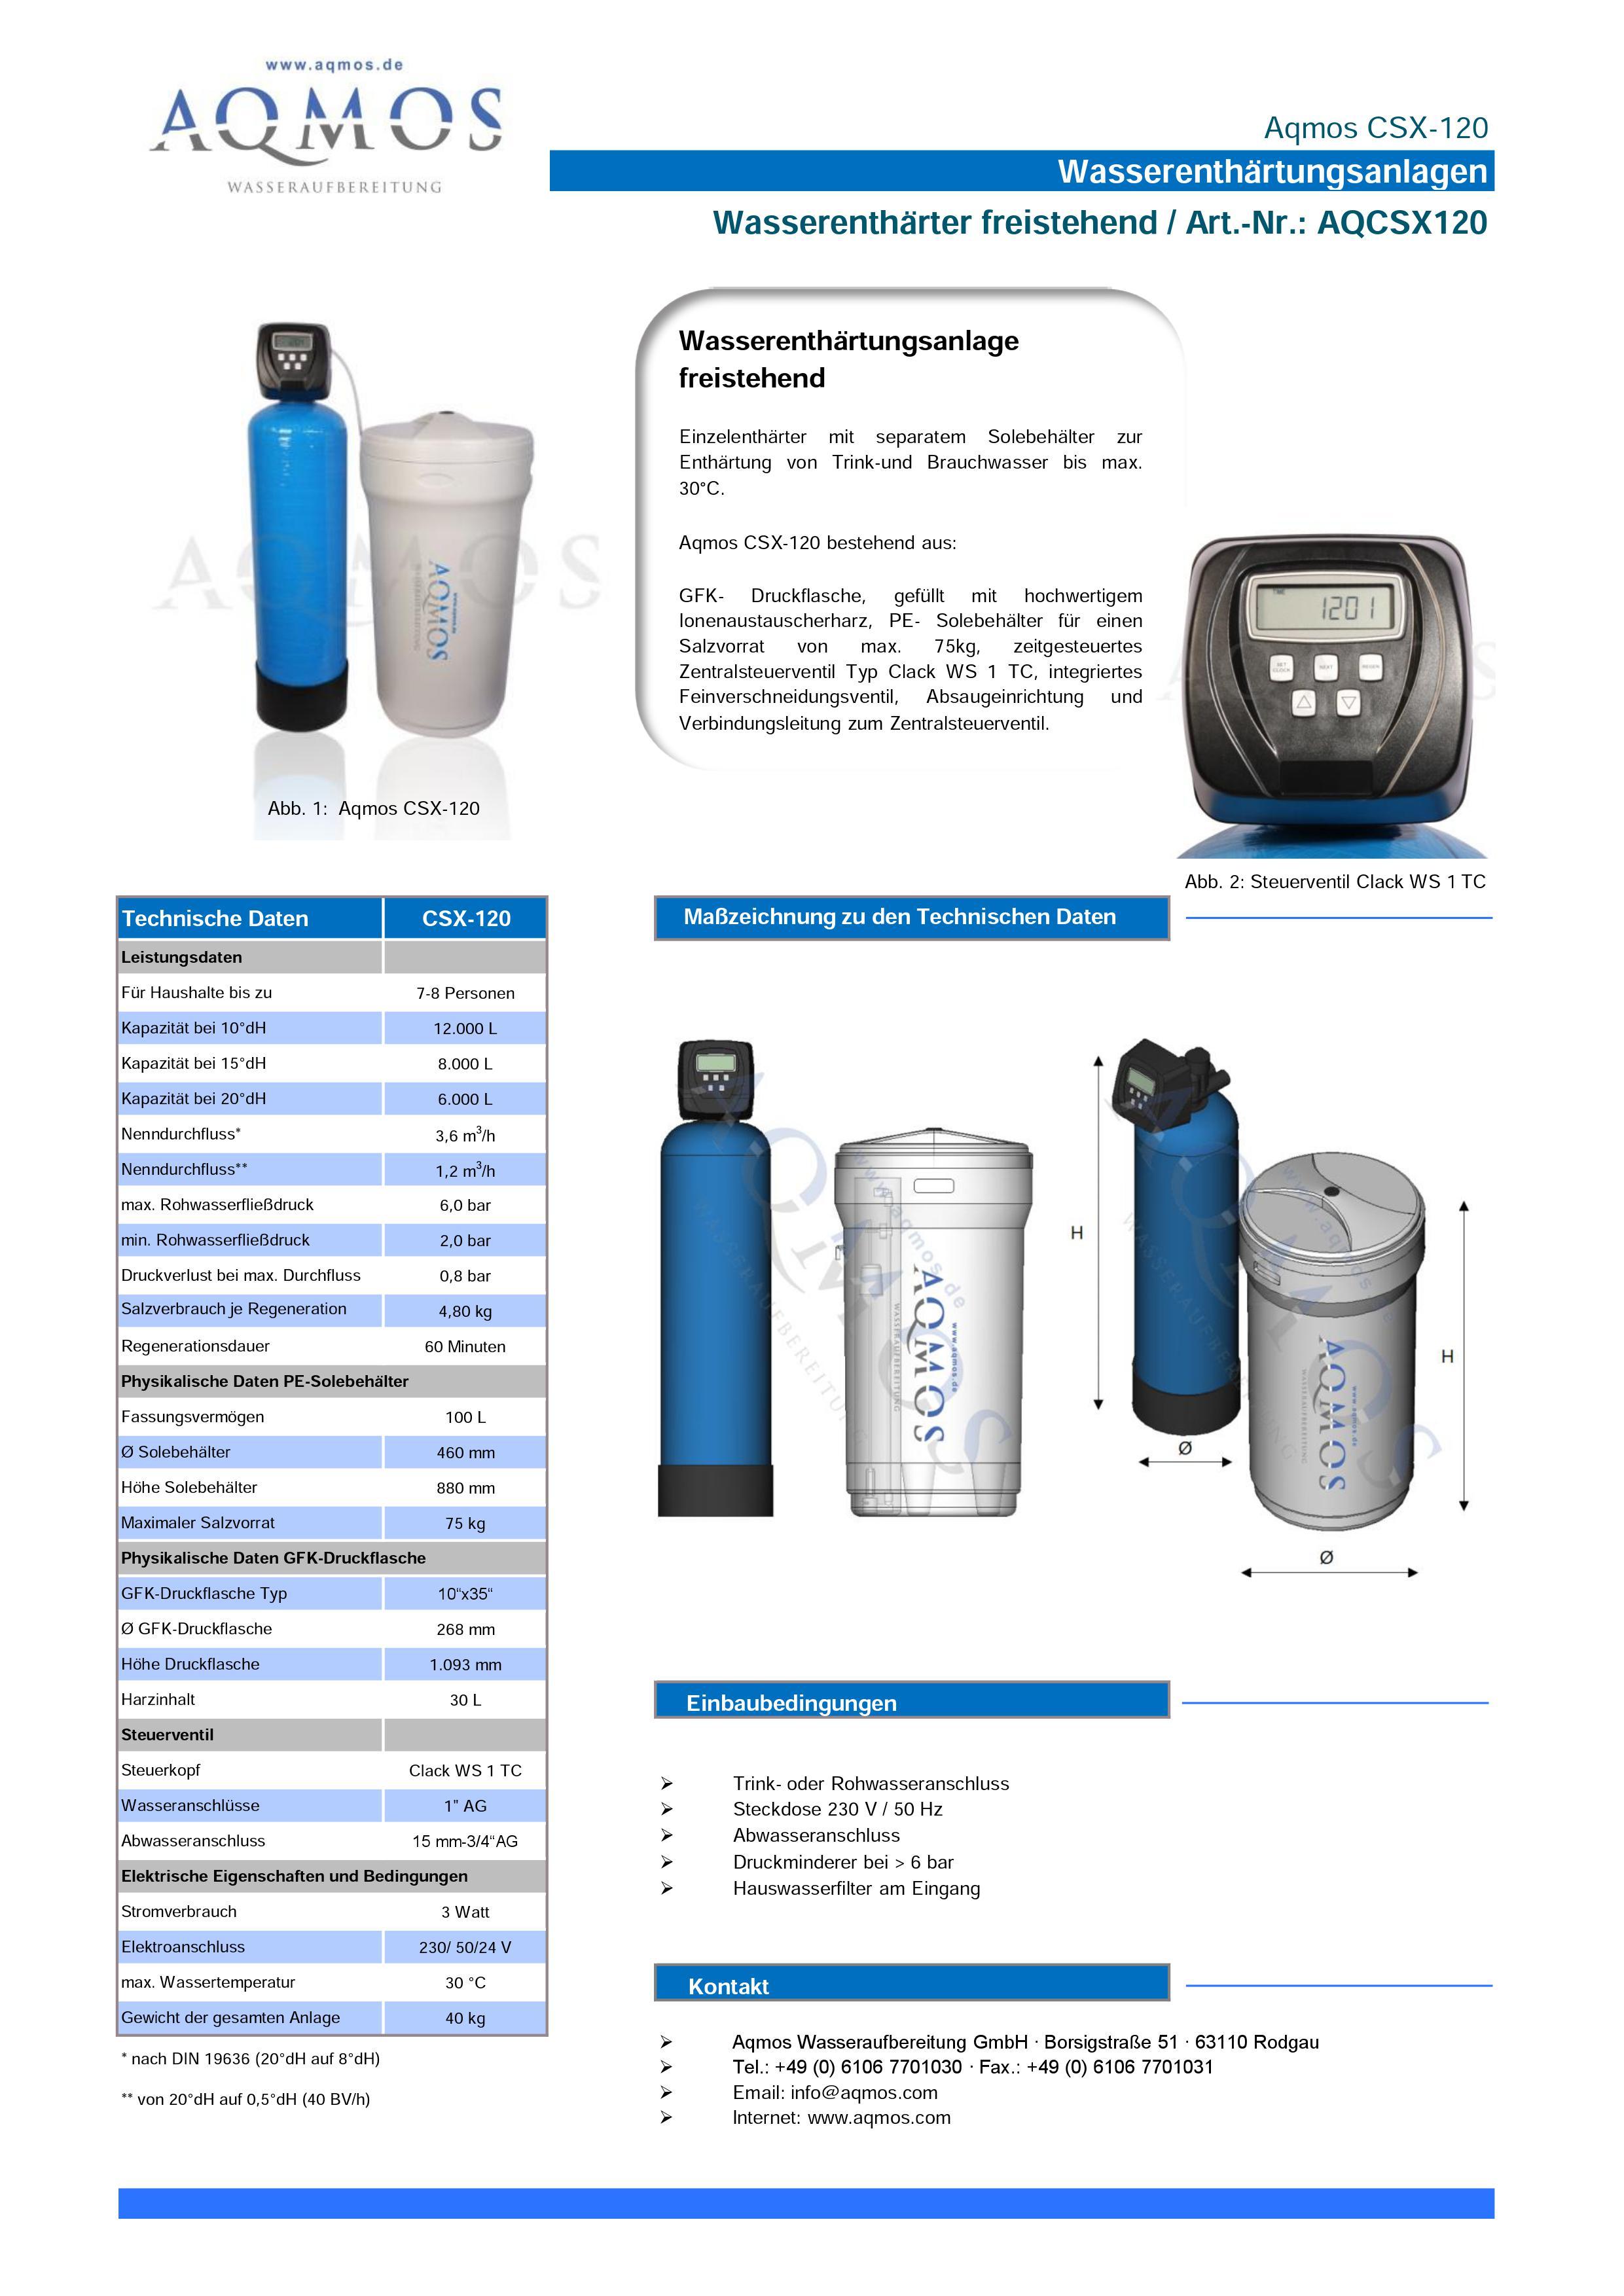 CSX-120-Datenblatt